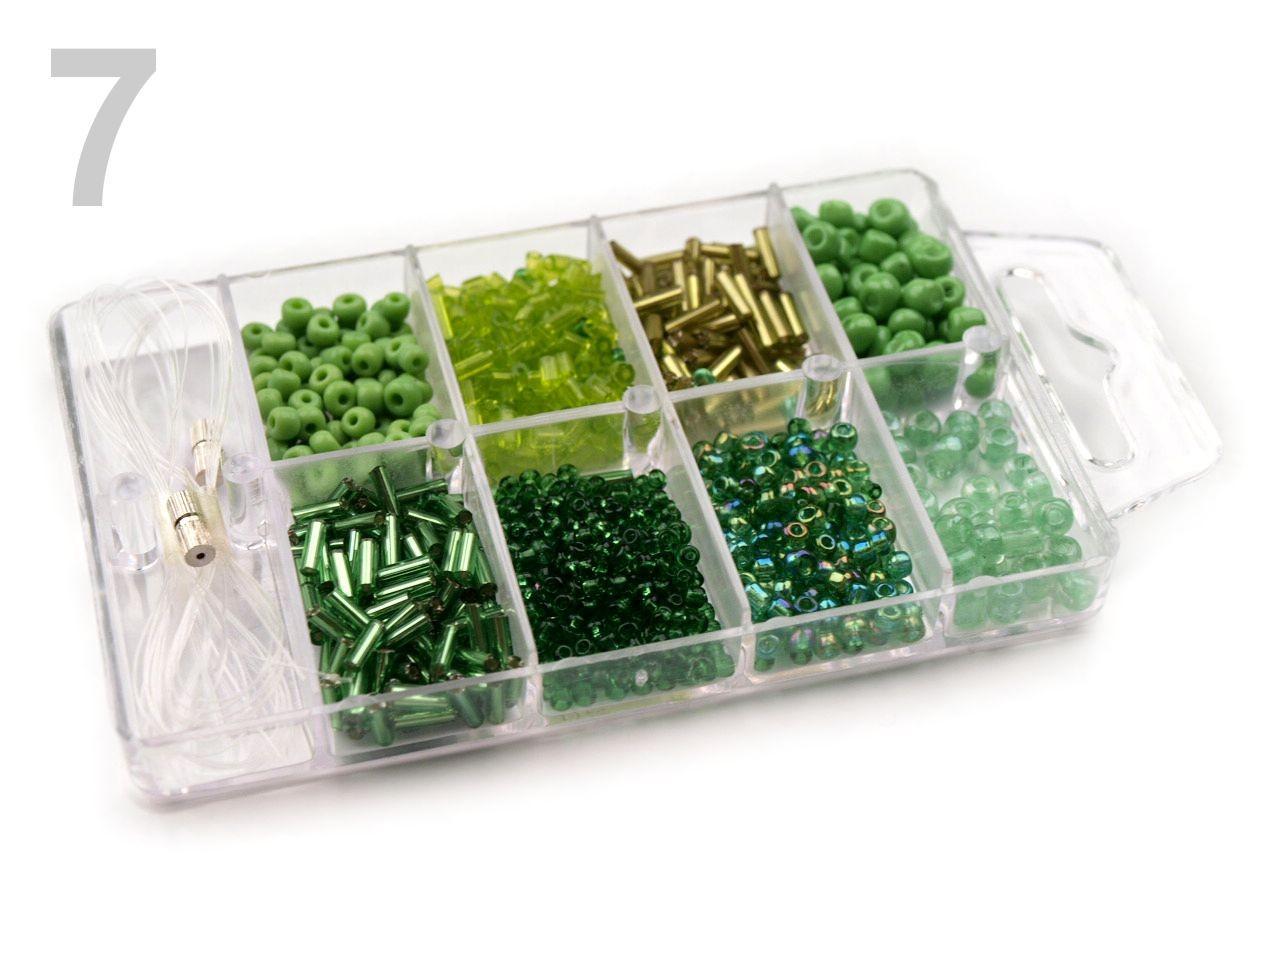 Korálky ROKAJL v plastovém boxu 210878 1krab, - 53 Kč / krab, 7 Amazon